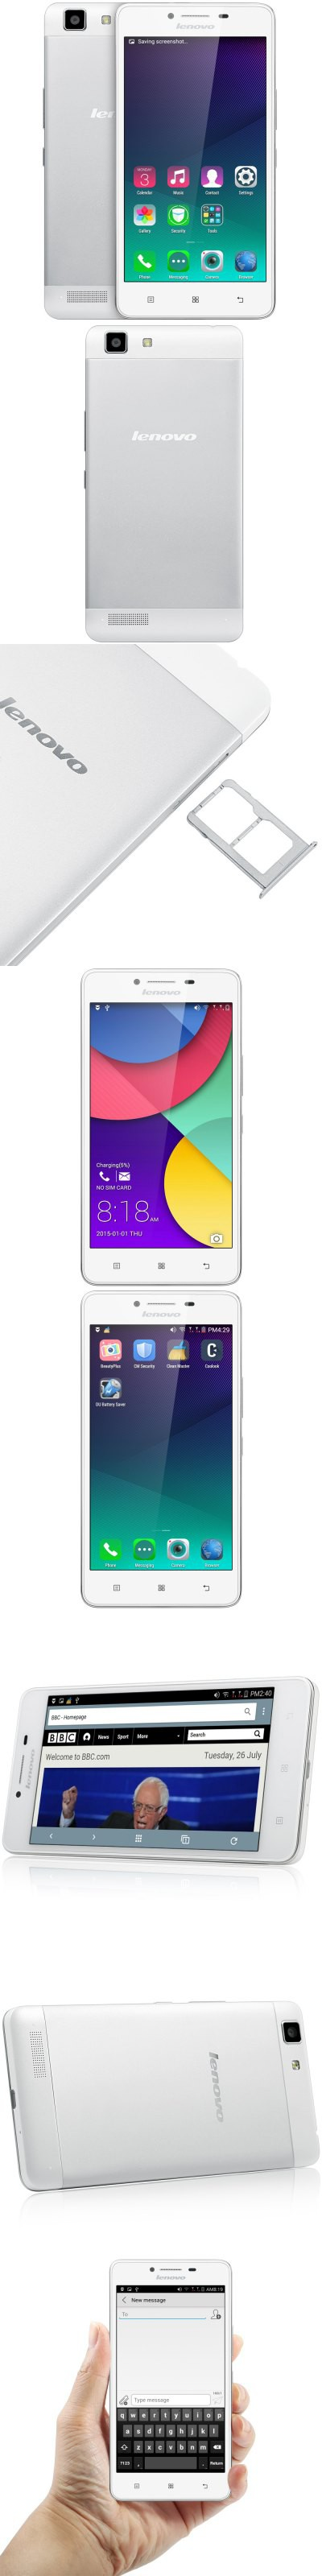 Android 4.4 5.0 inch MTK6732 Quad Core 1.5GHz 1GB RAM 8GB ROM Gravity Sensor Bluetooth 4.0 GPS